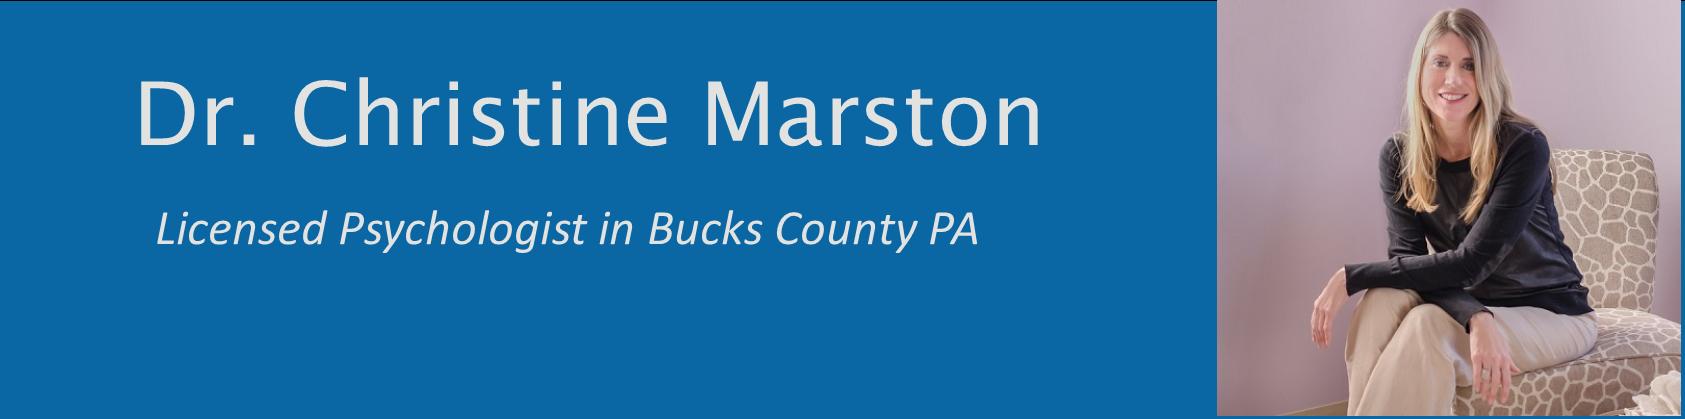 Dr. Christine Marston